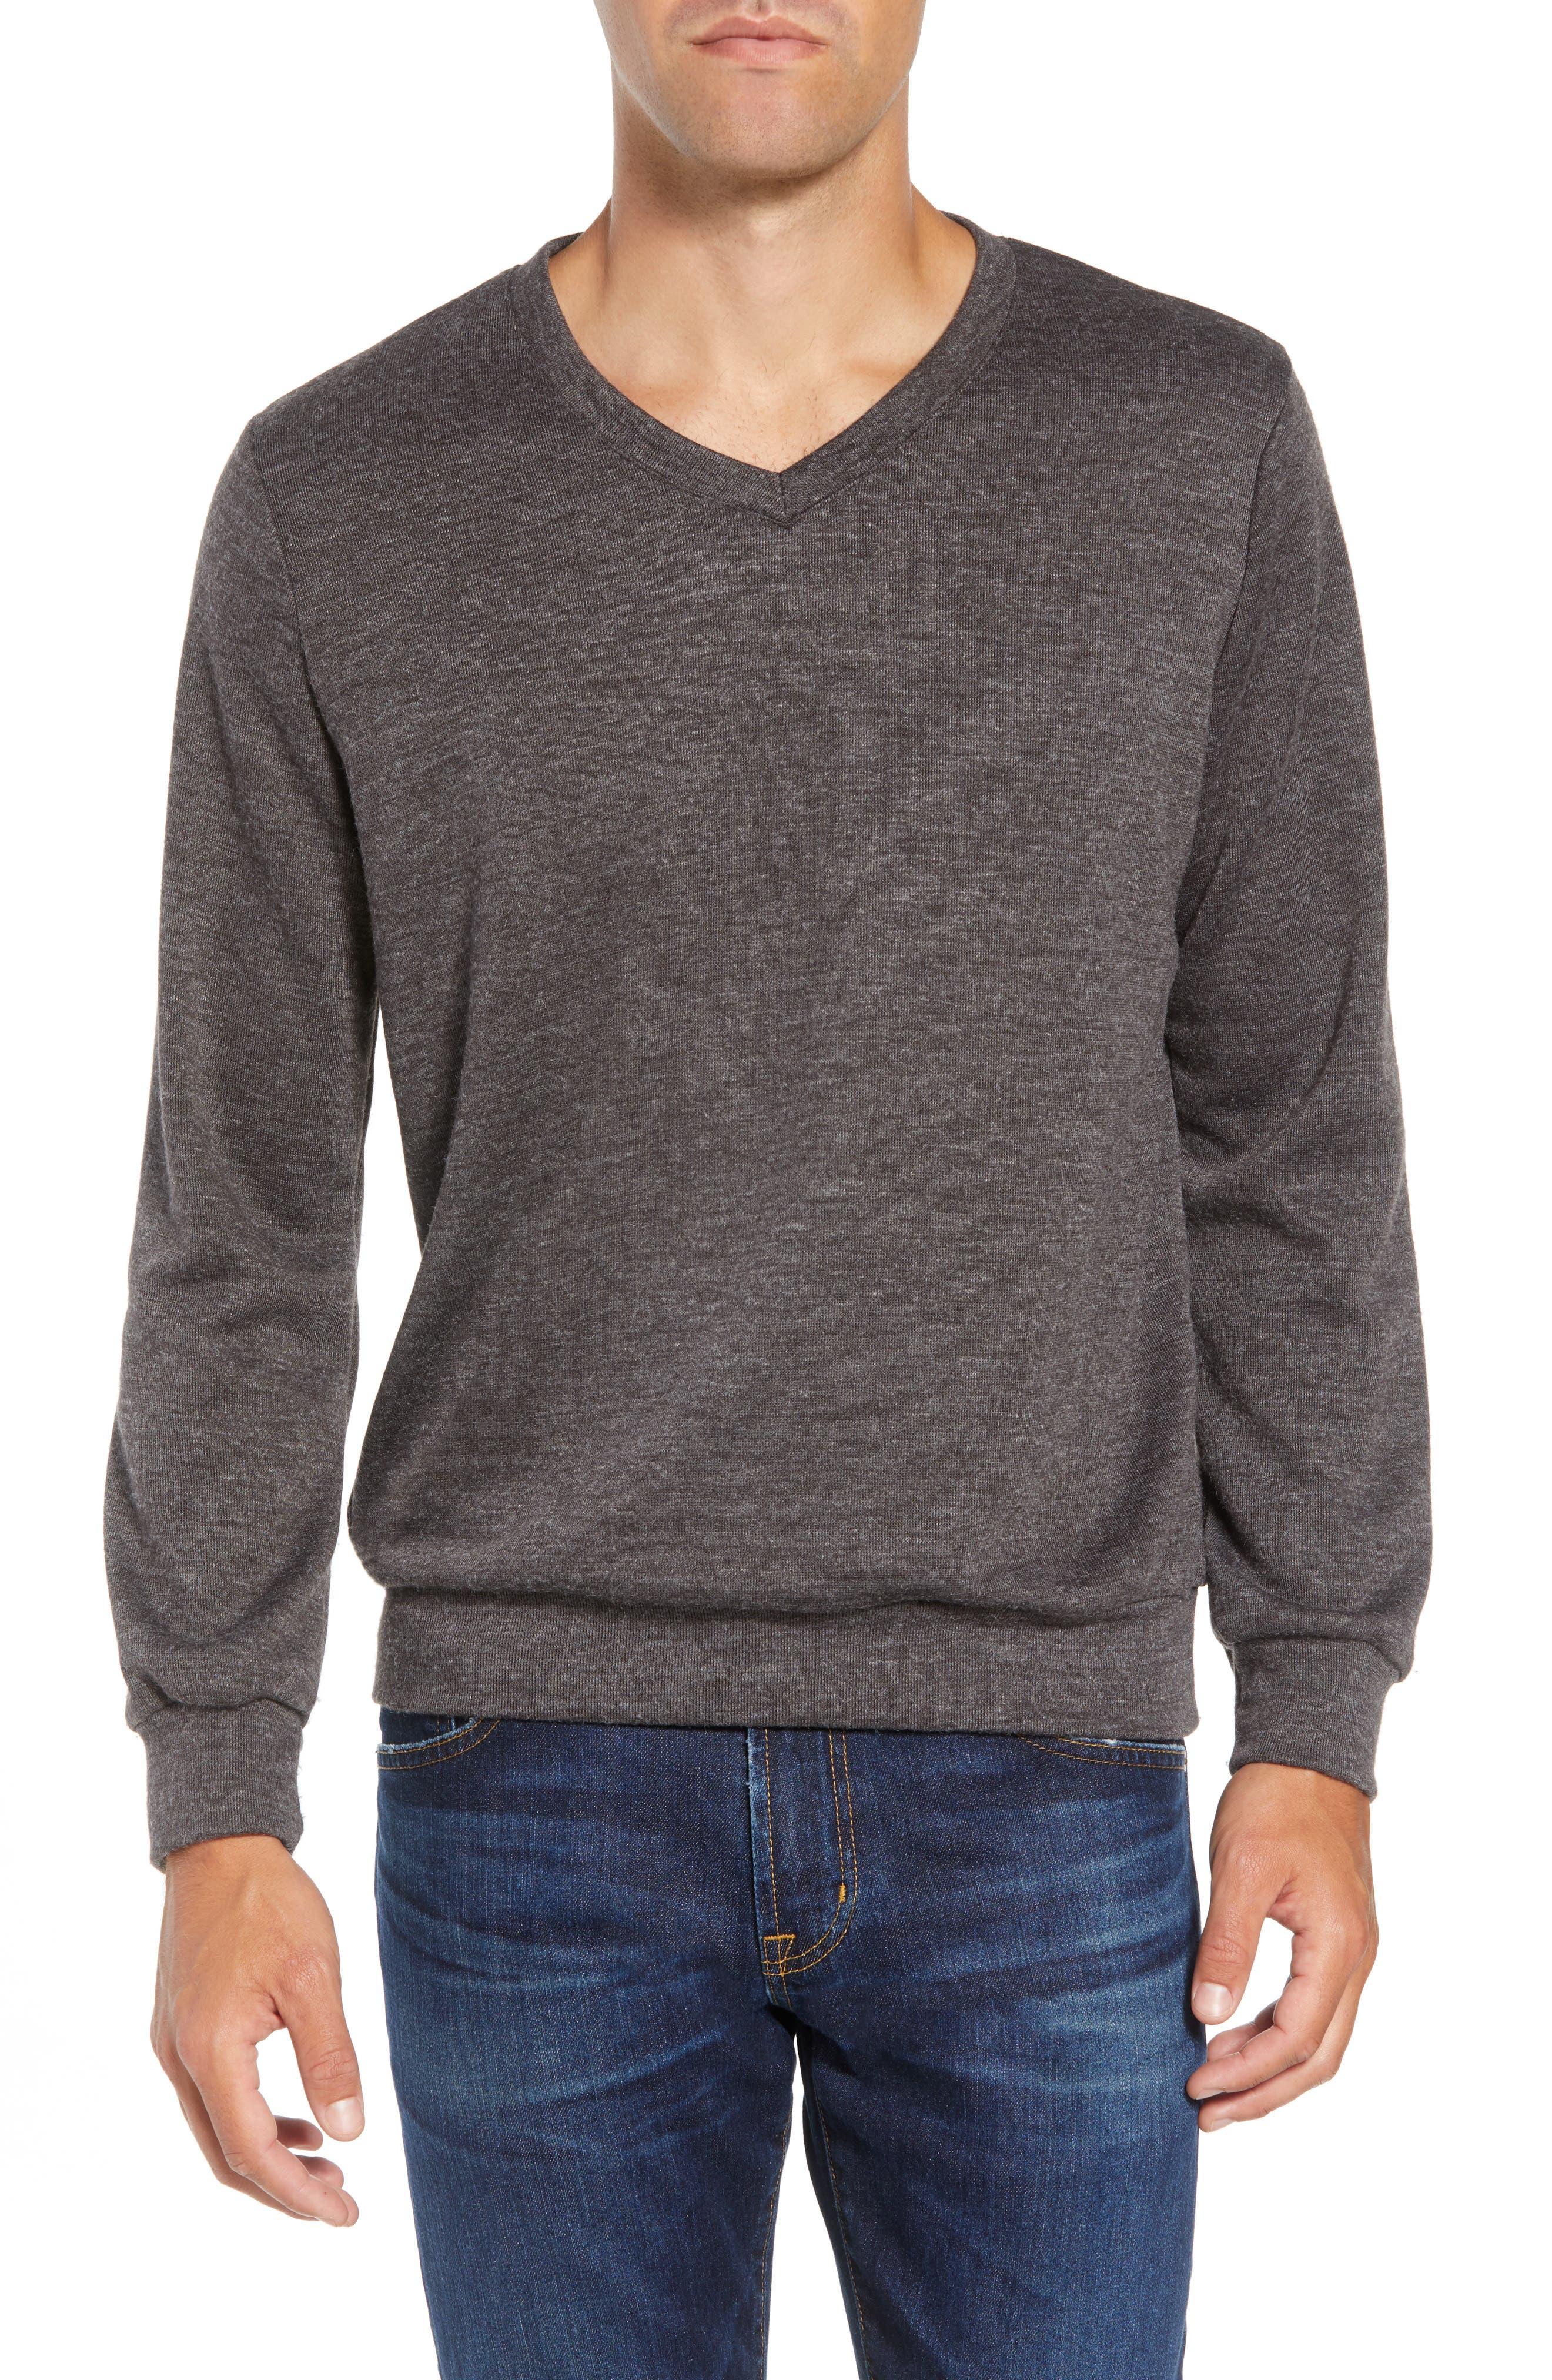 Prospect V-Neck Performance Sweater,                             Main thumbnail 1, color,                             CHARCOAL